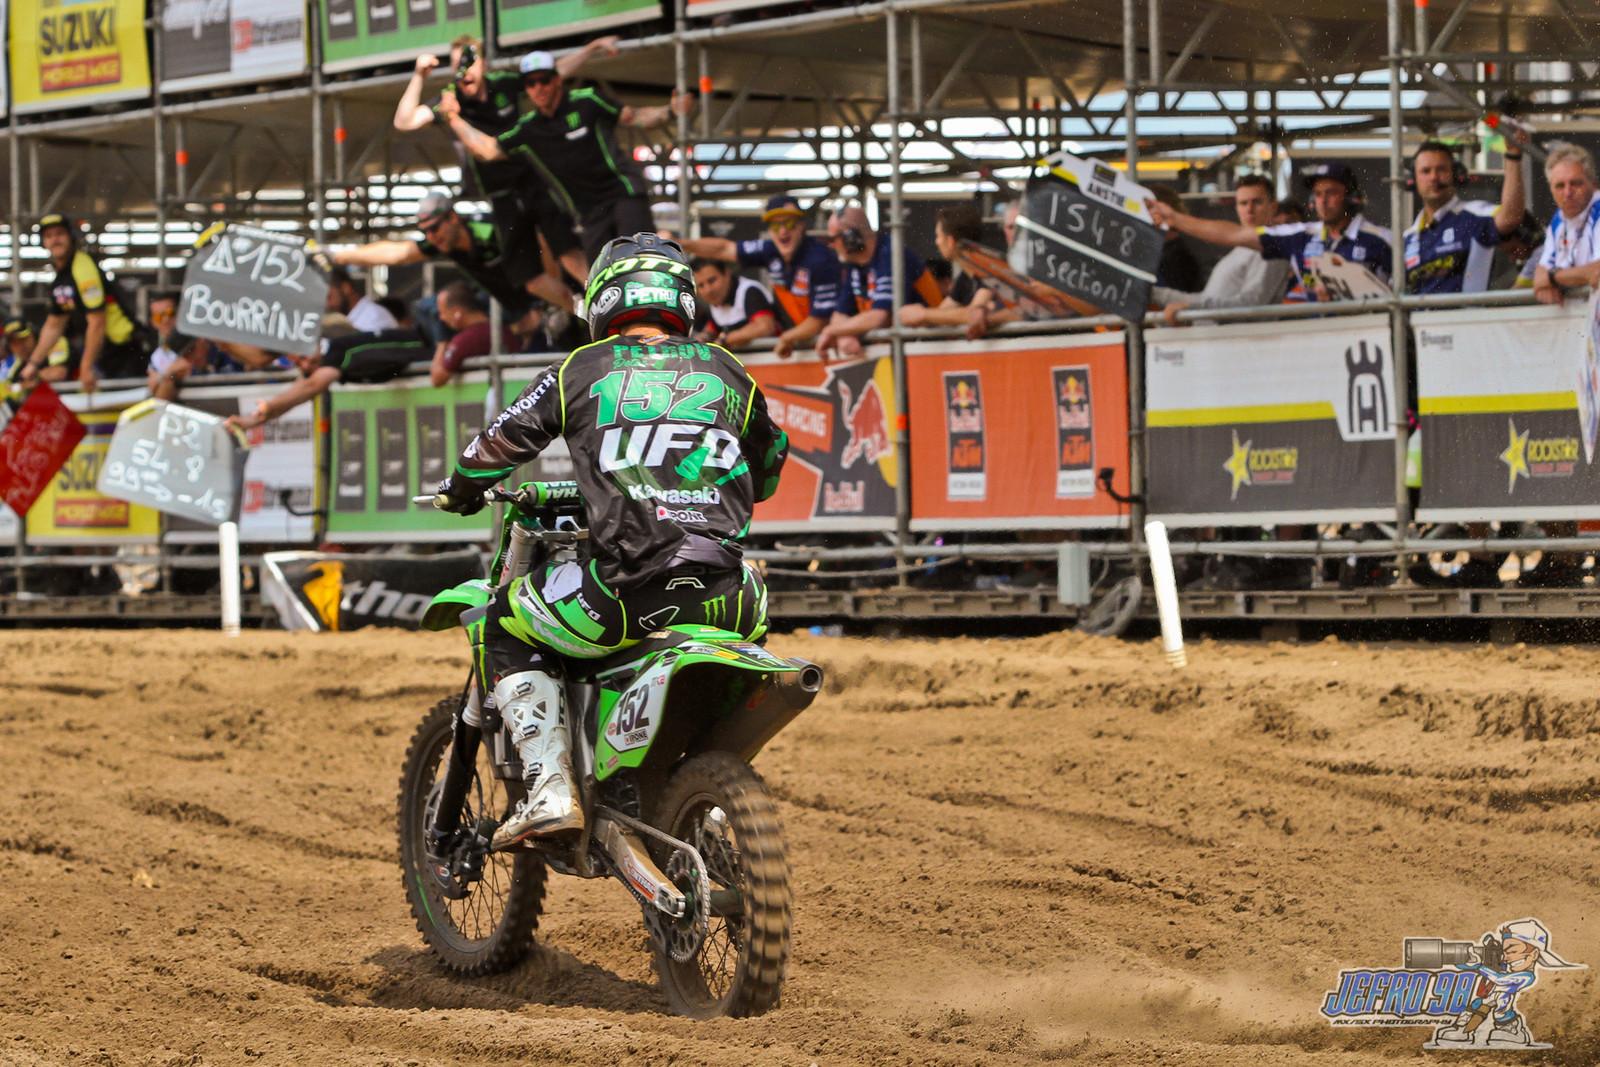 Petar Petrov - Photo Gallery: MXGP of Limburg - Motocross Pictures - Vital MX